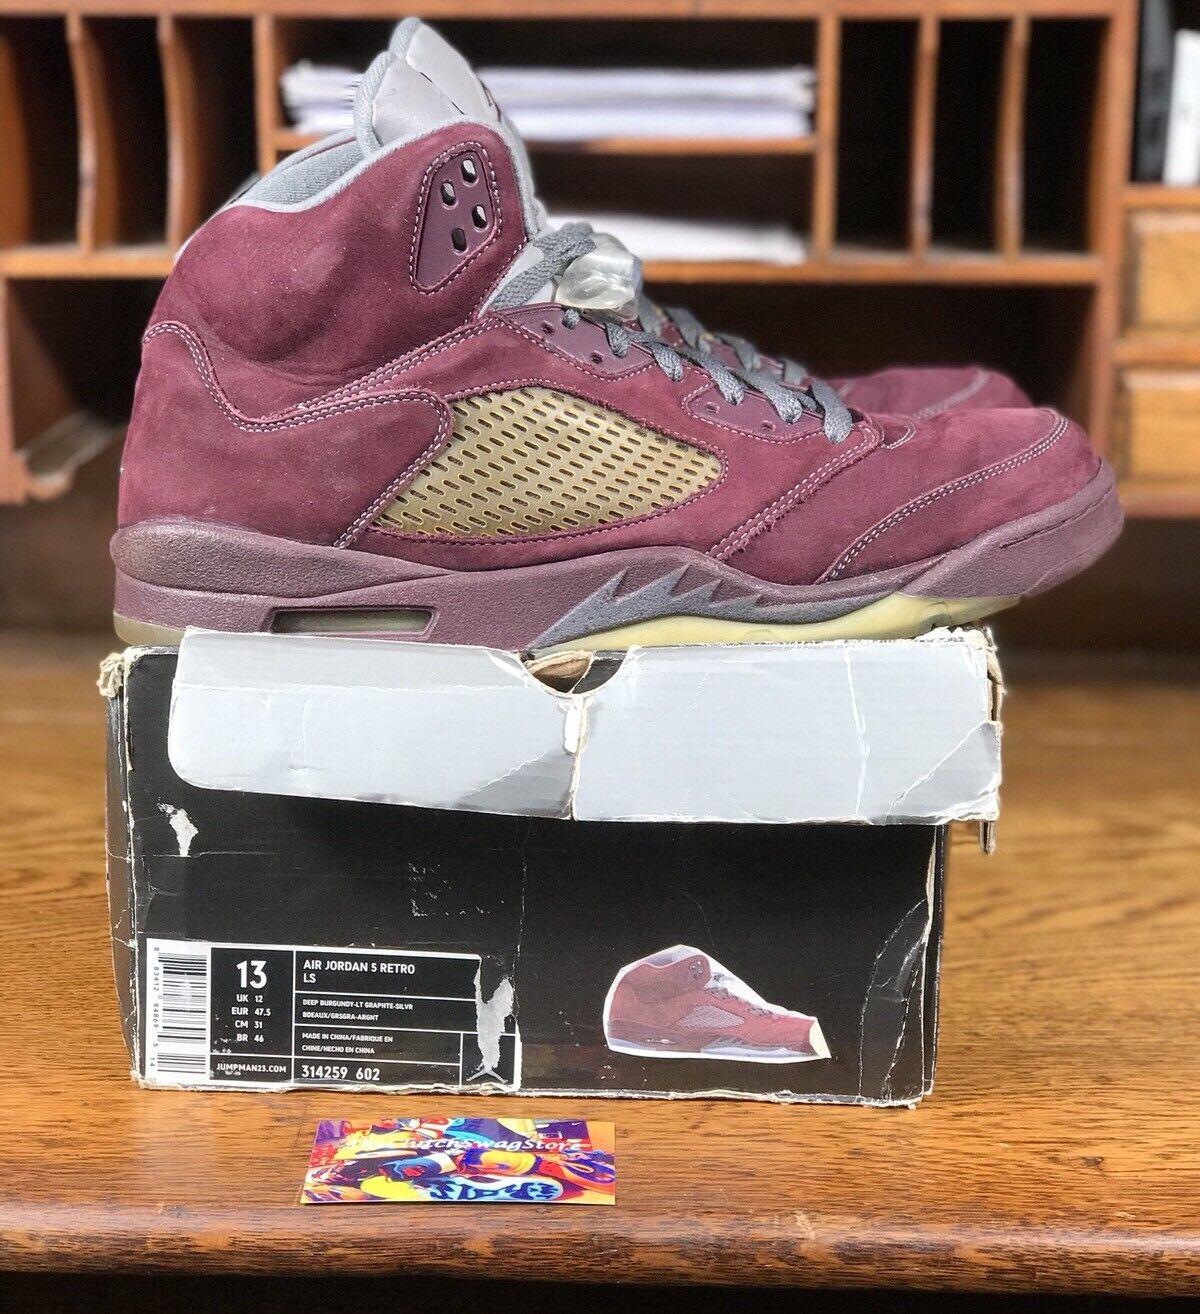 9f4ad90c170 2006 Nike Air Jordan 5 Retro LS Burgundy Men shoes (314259-602) Size ...